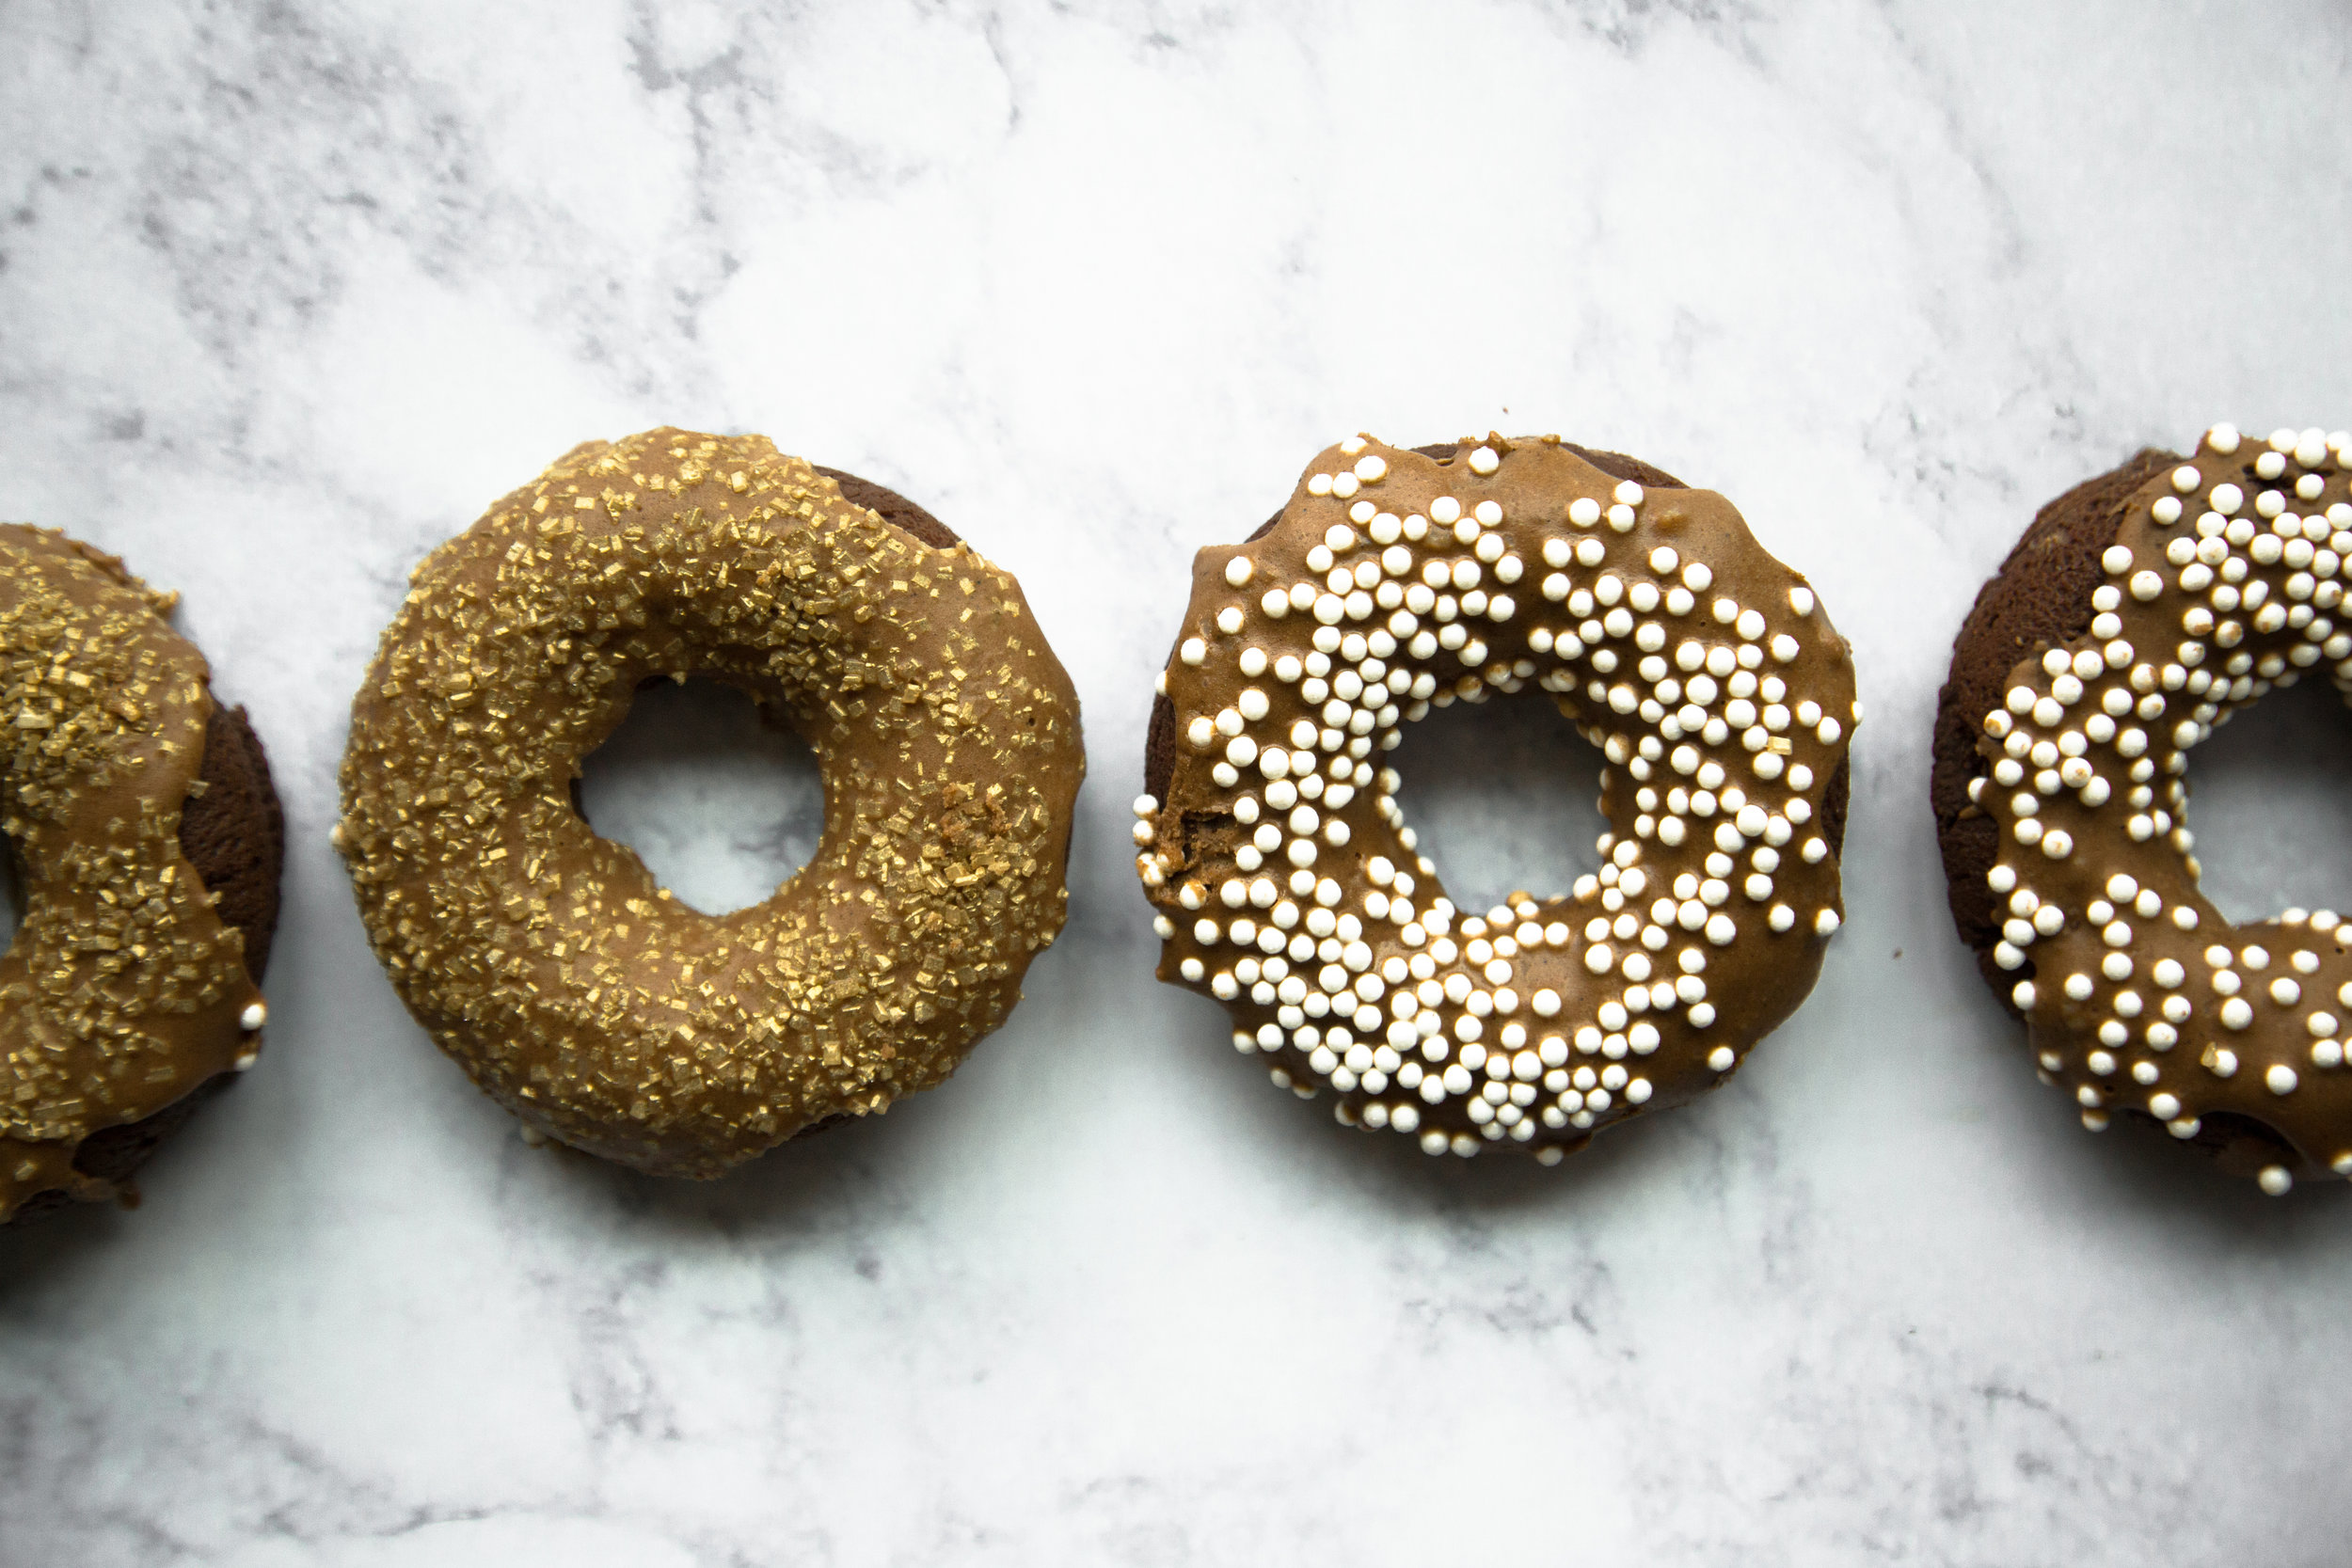 paige_doughnuts_nocow_21.jpg